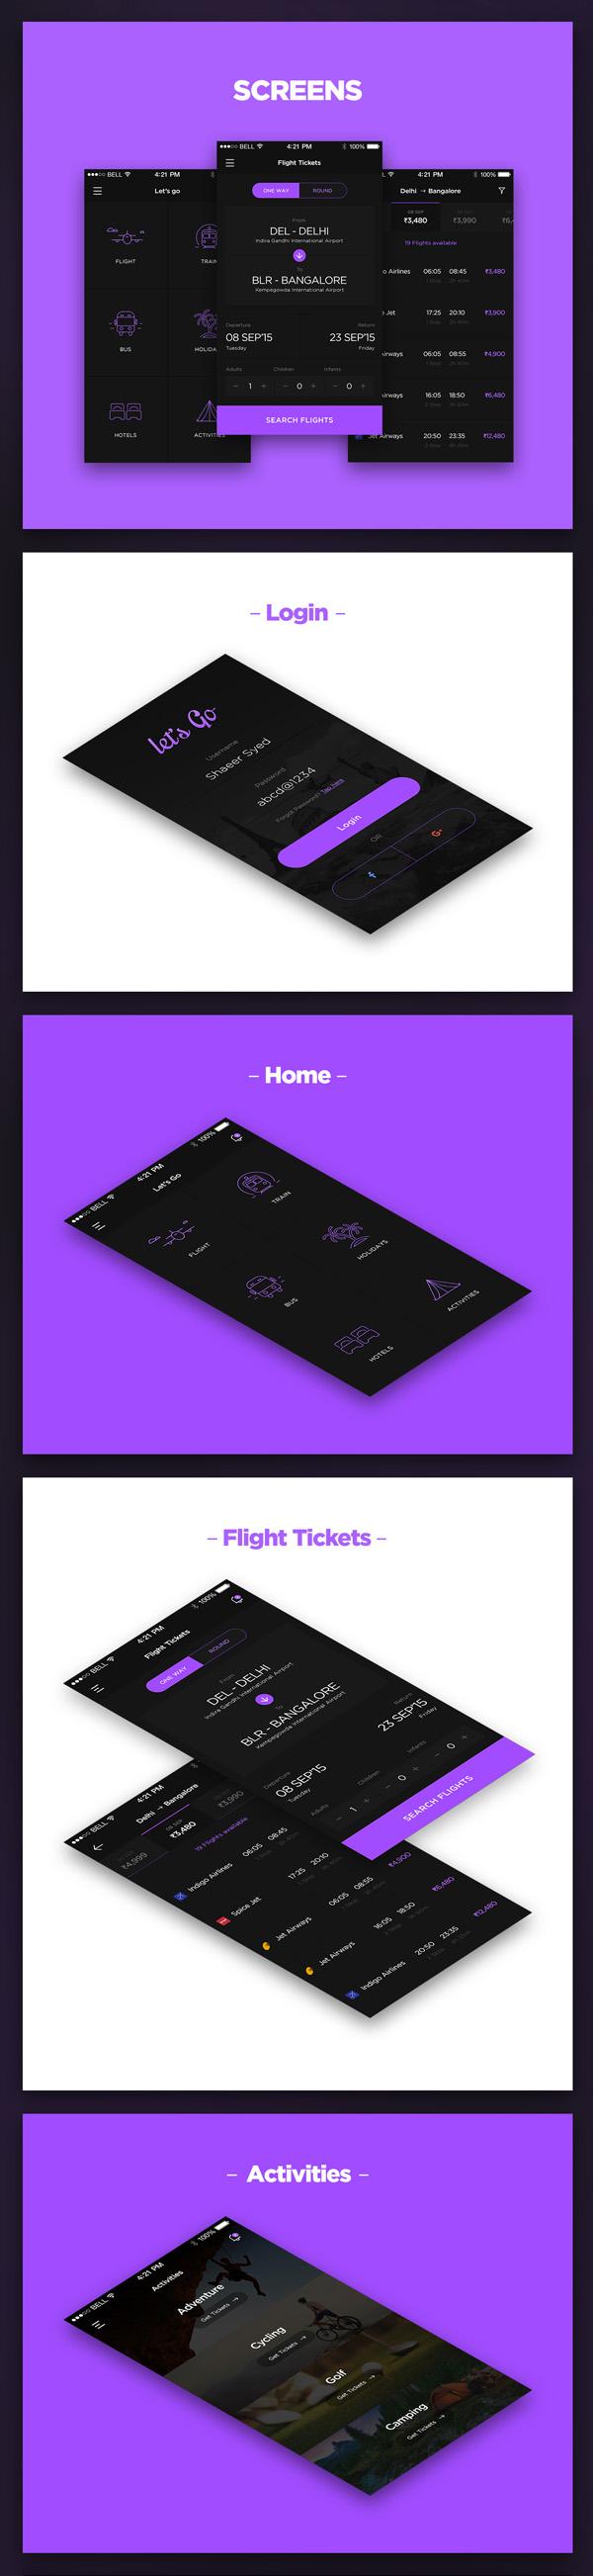 Travel App iOS Screens Free PSD Download